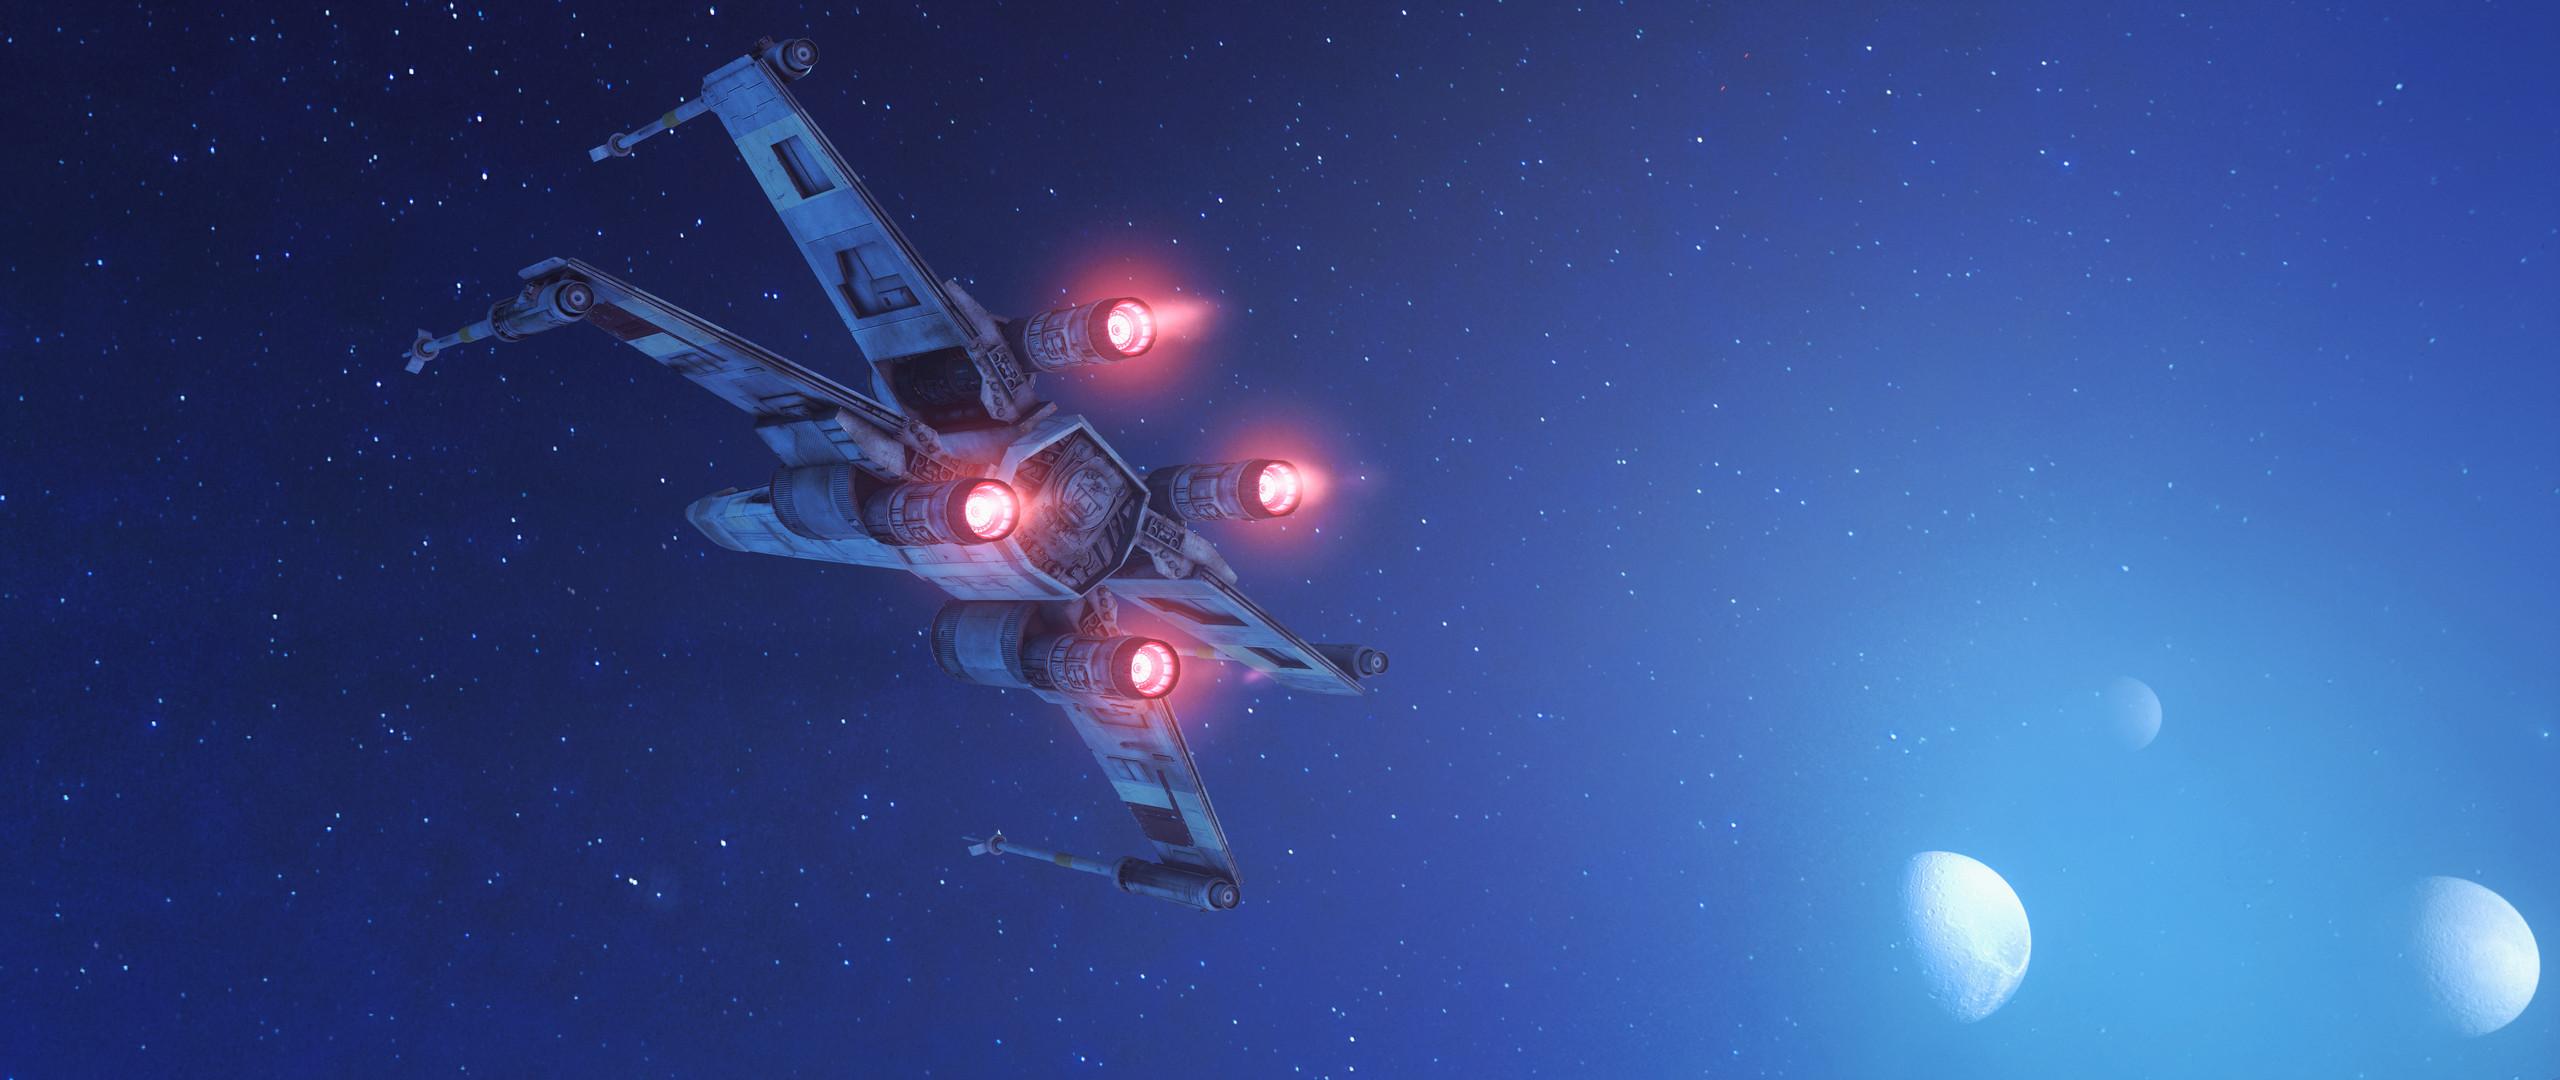 Video Game - Star Wars Battlefront (2015) X-Wing Wallpaper